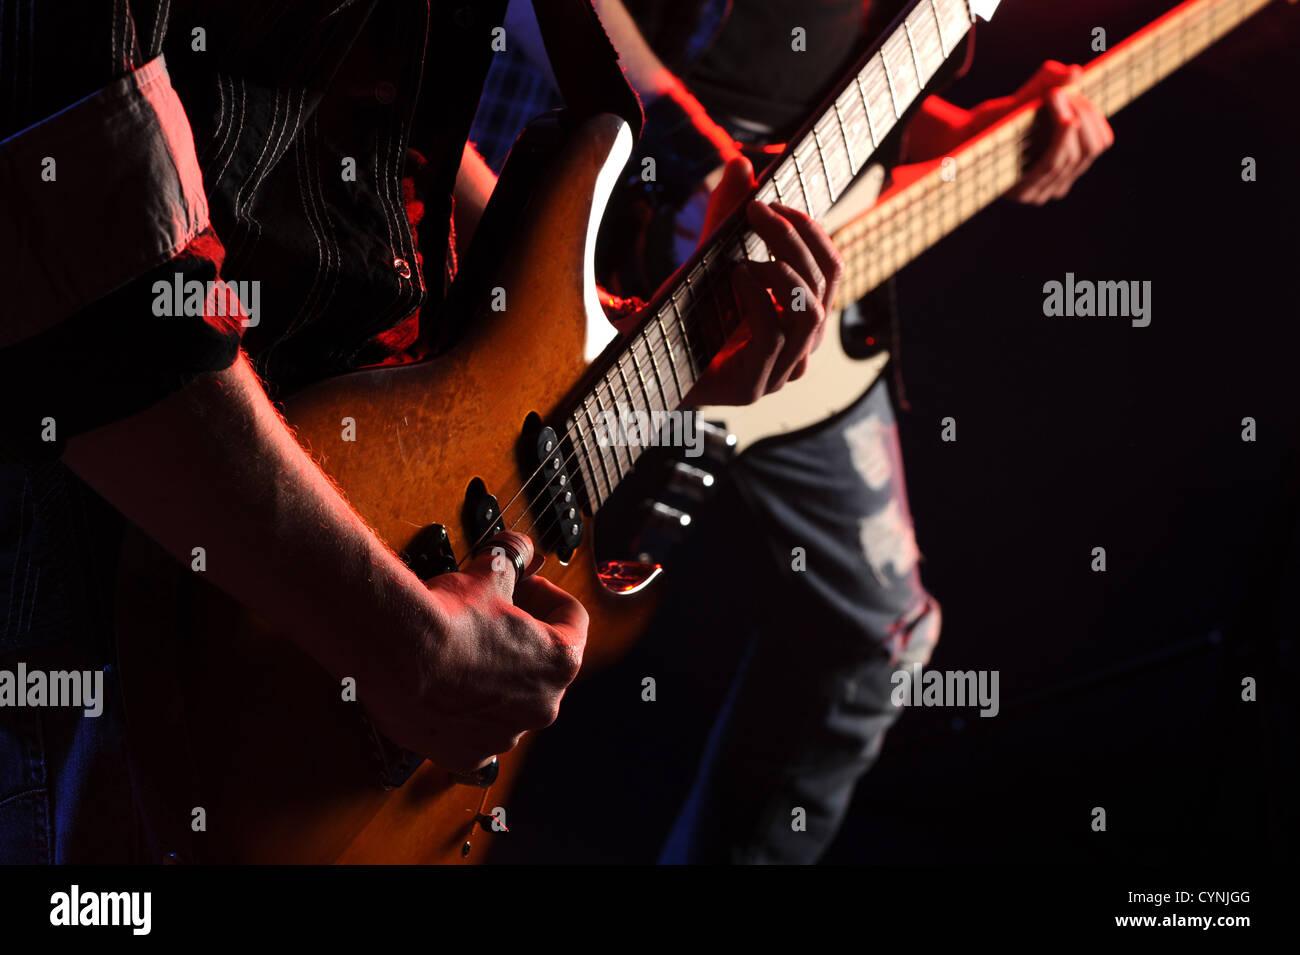 Rock-Musiker spielen bei einem live-Konzert Stockbild